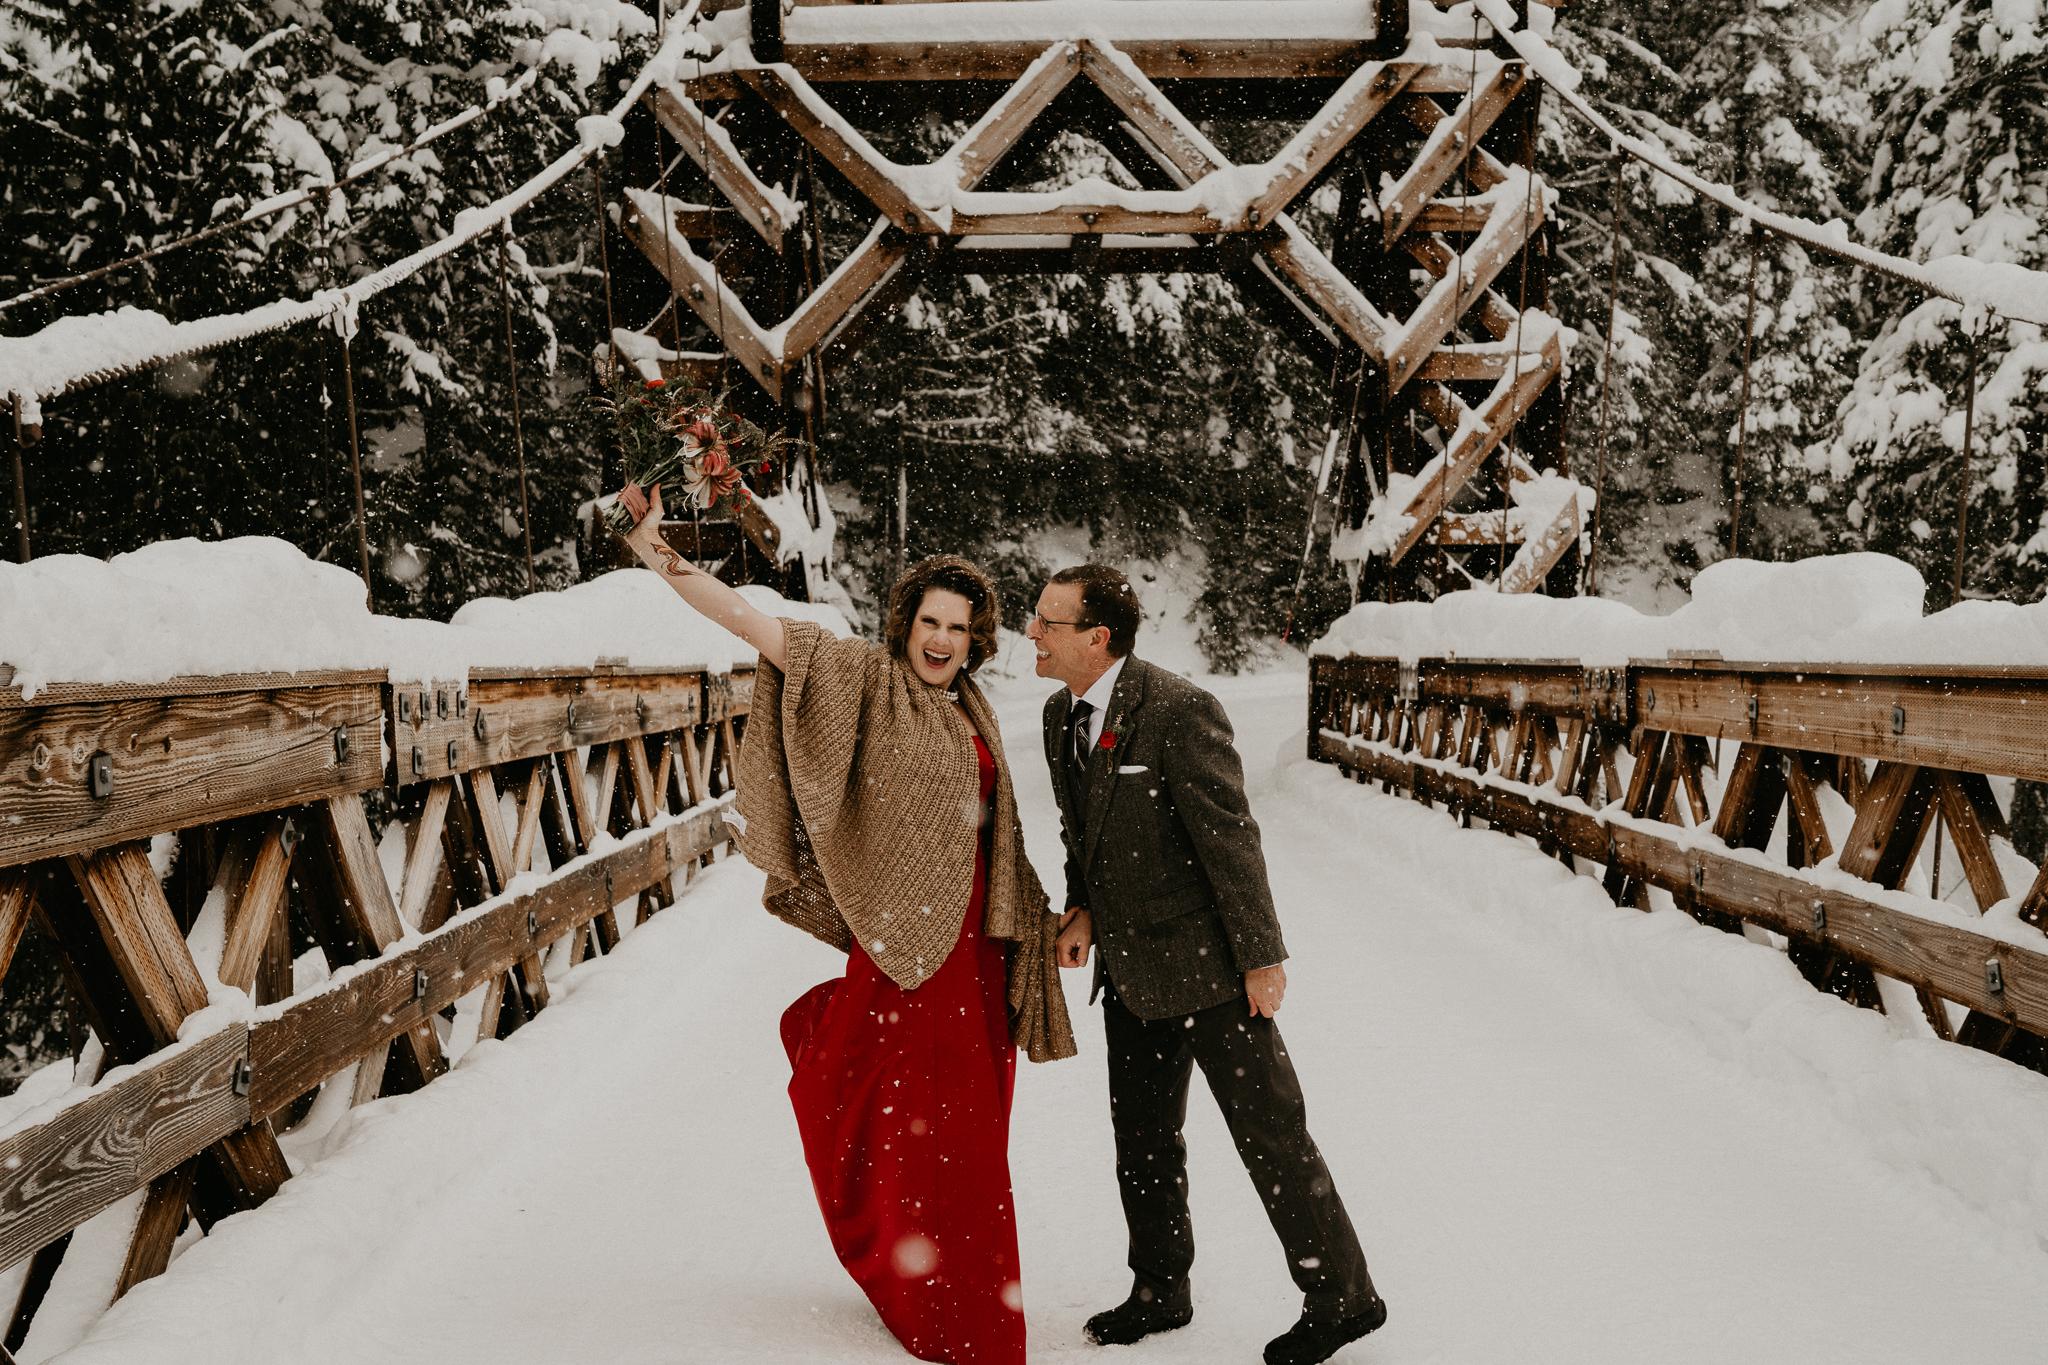 Mount-Rainier-Snow-Winter-Elopement-Adventure-Photographer2-51.jpg